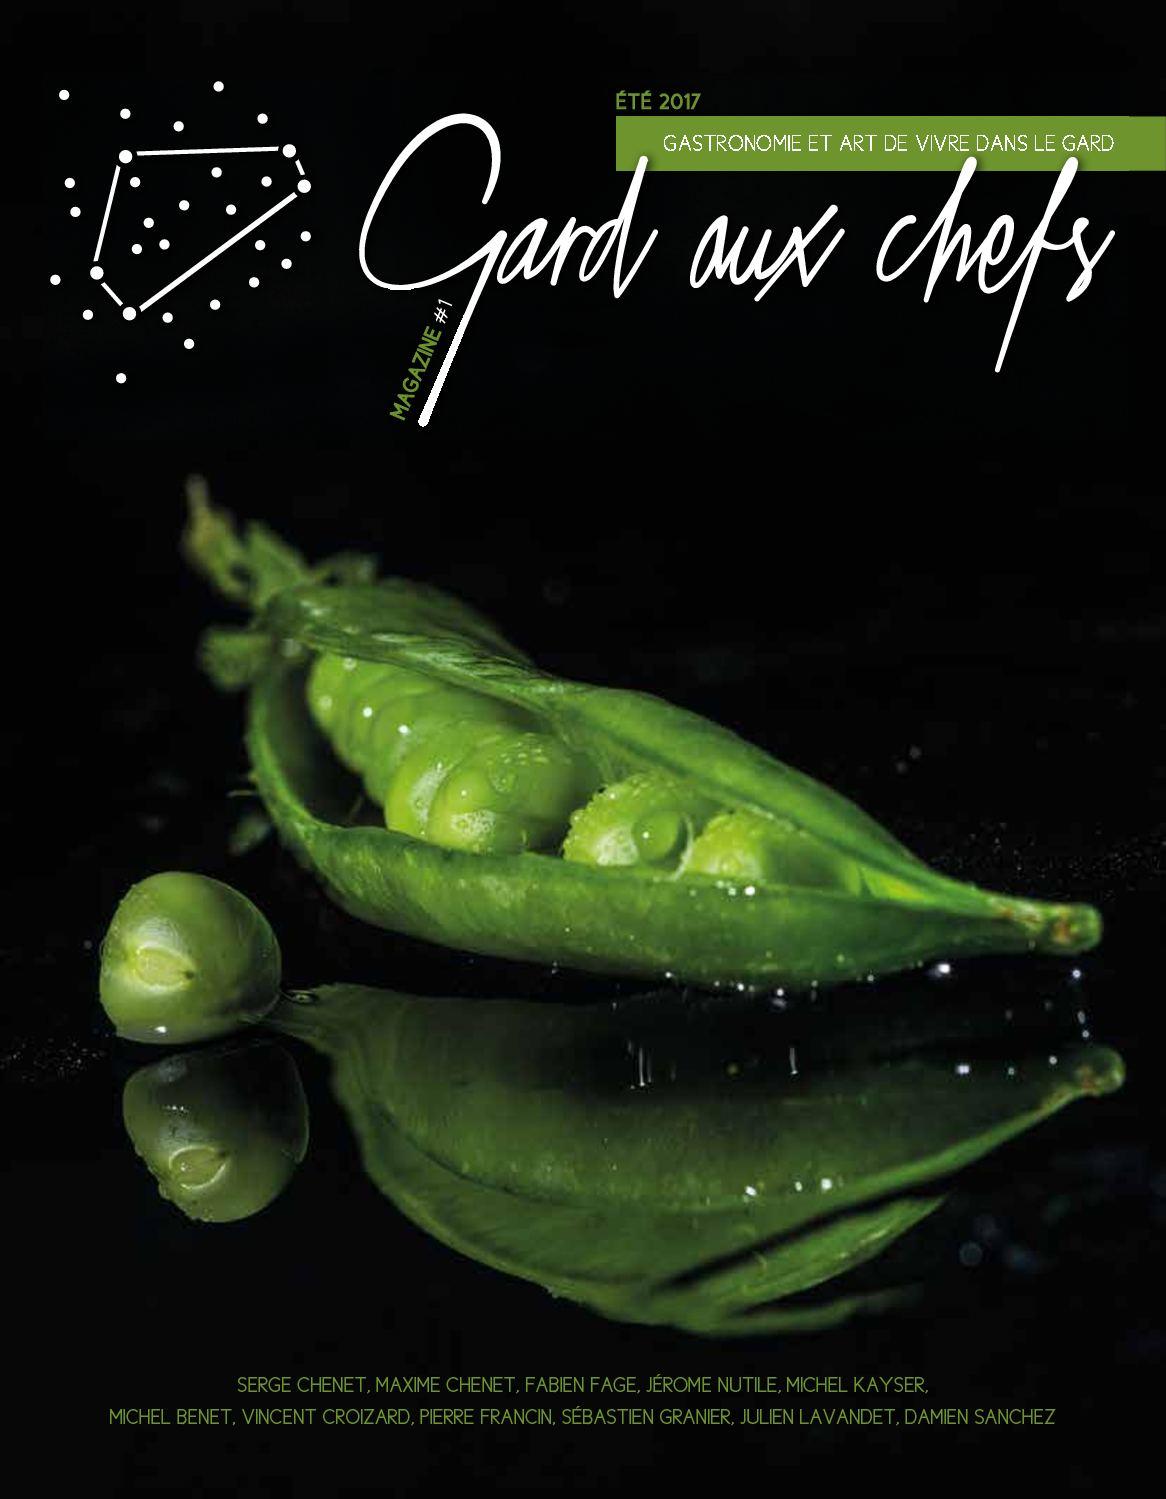 Calameo Magazine Gard Aux Chefs 01